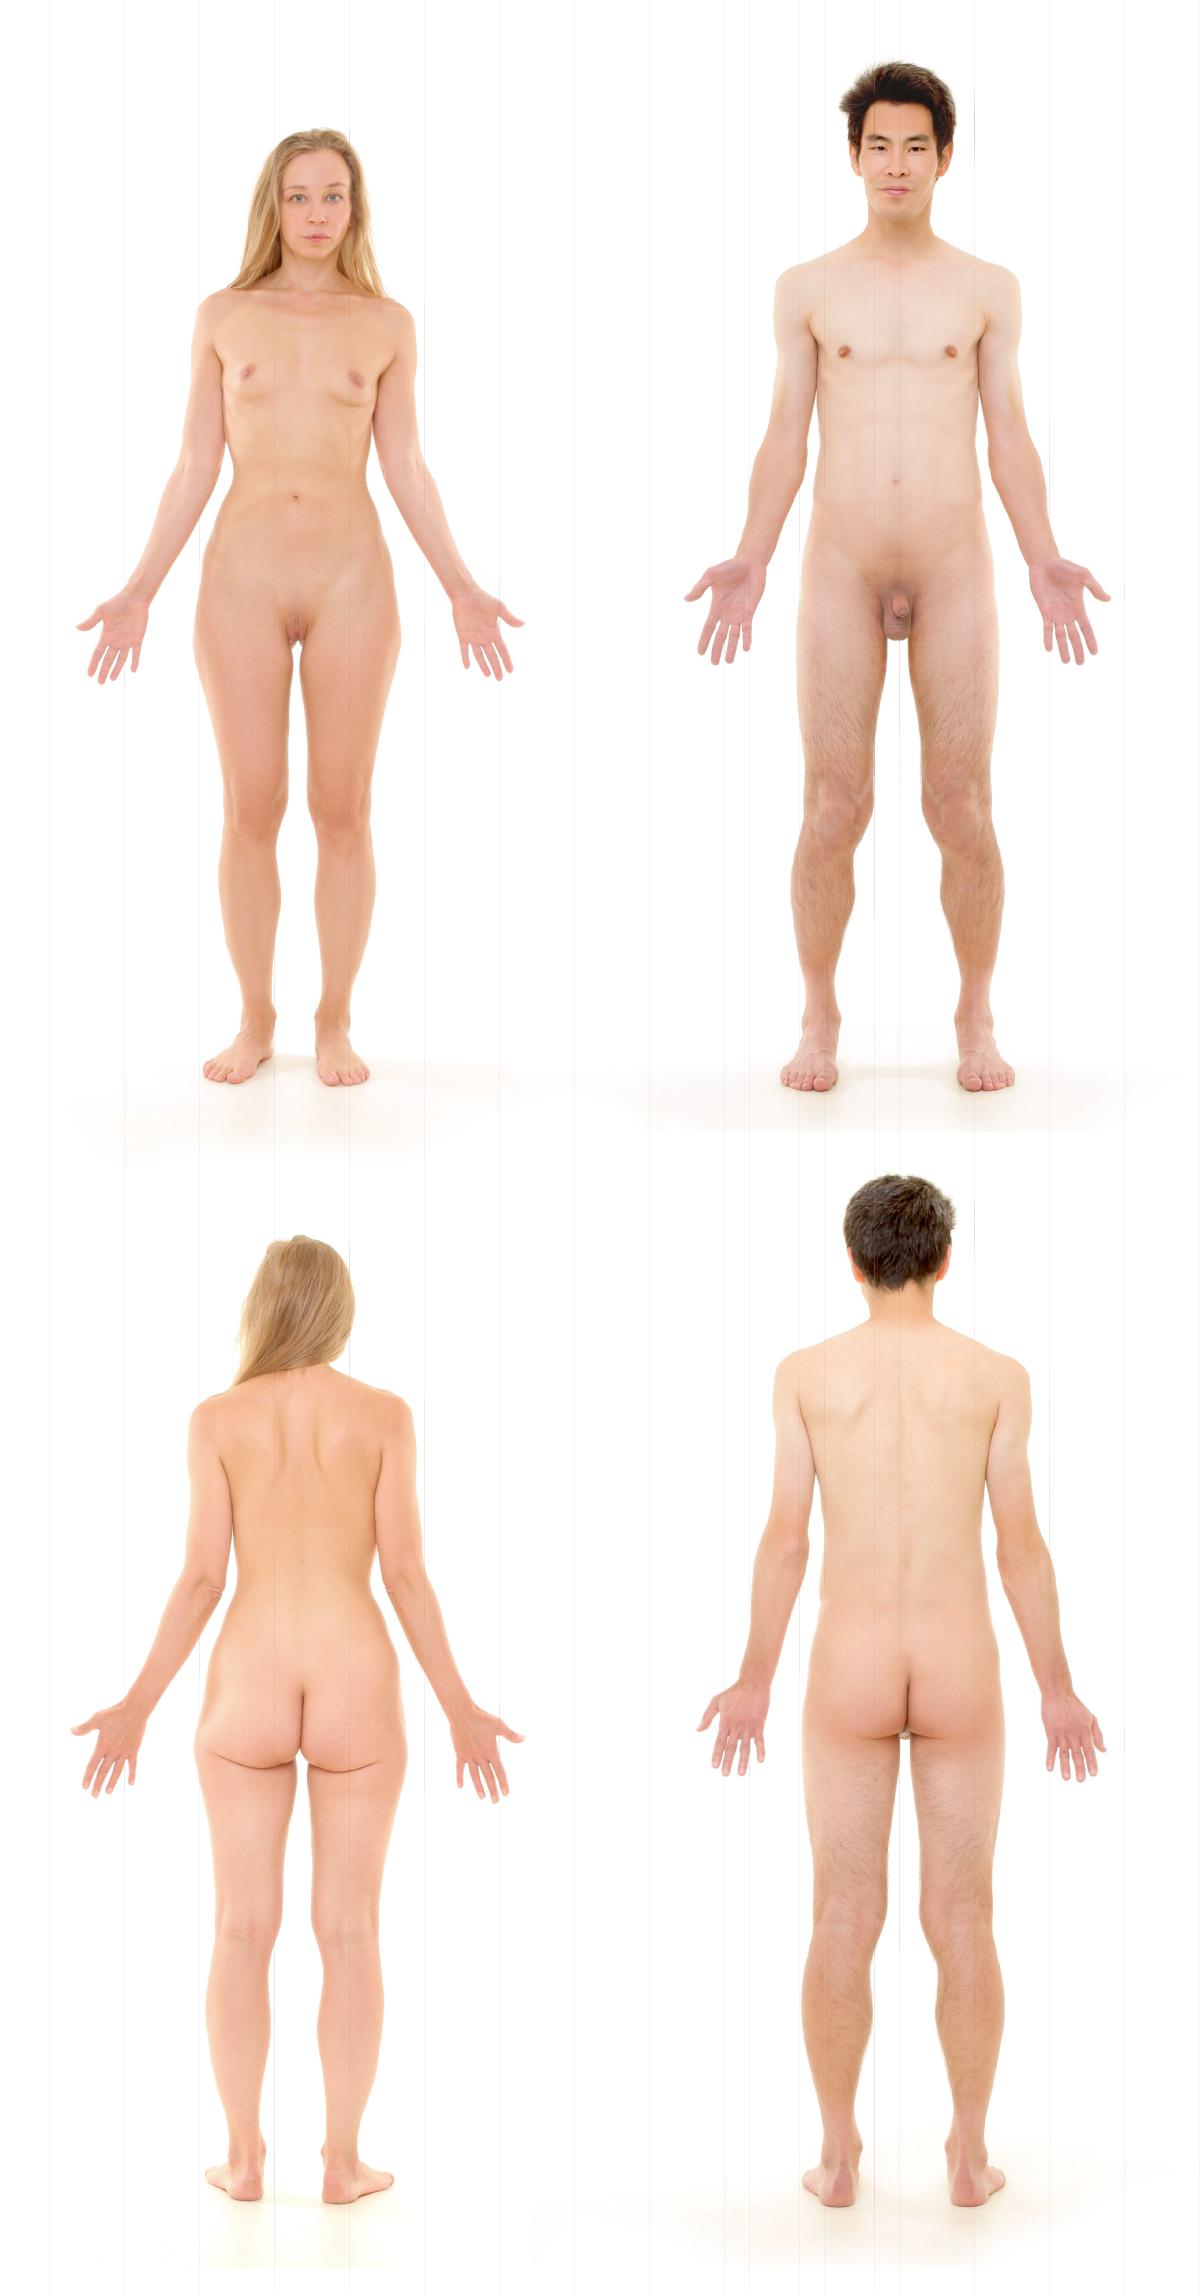 Wwe nikki bella get fucked hardcore nude